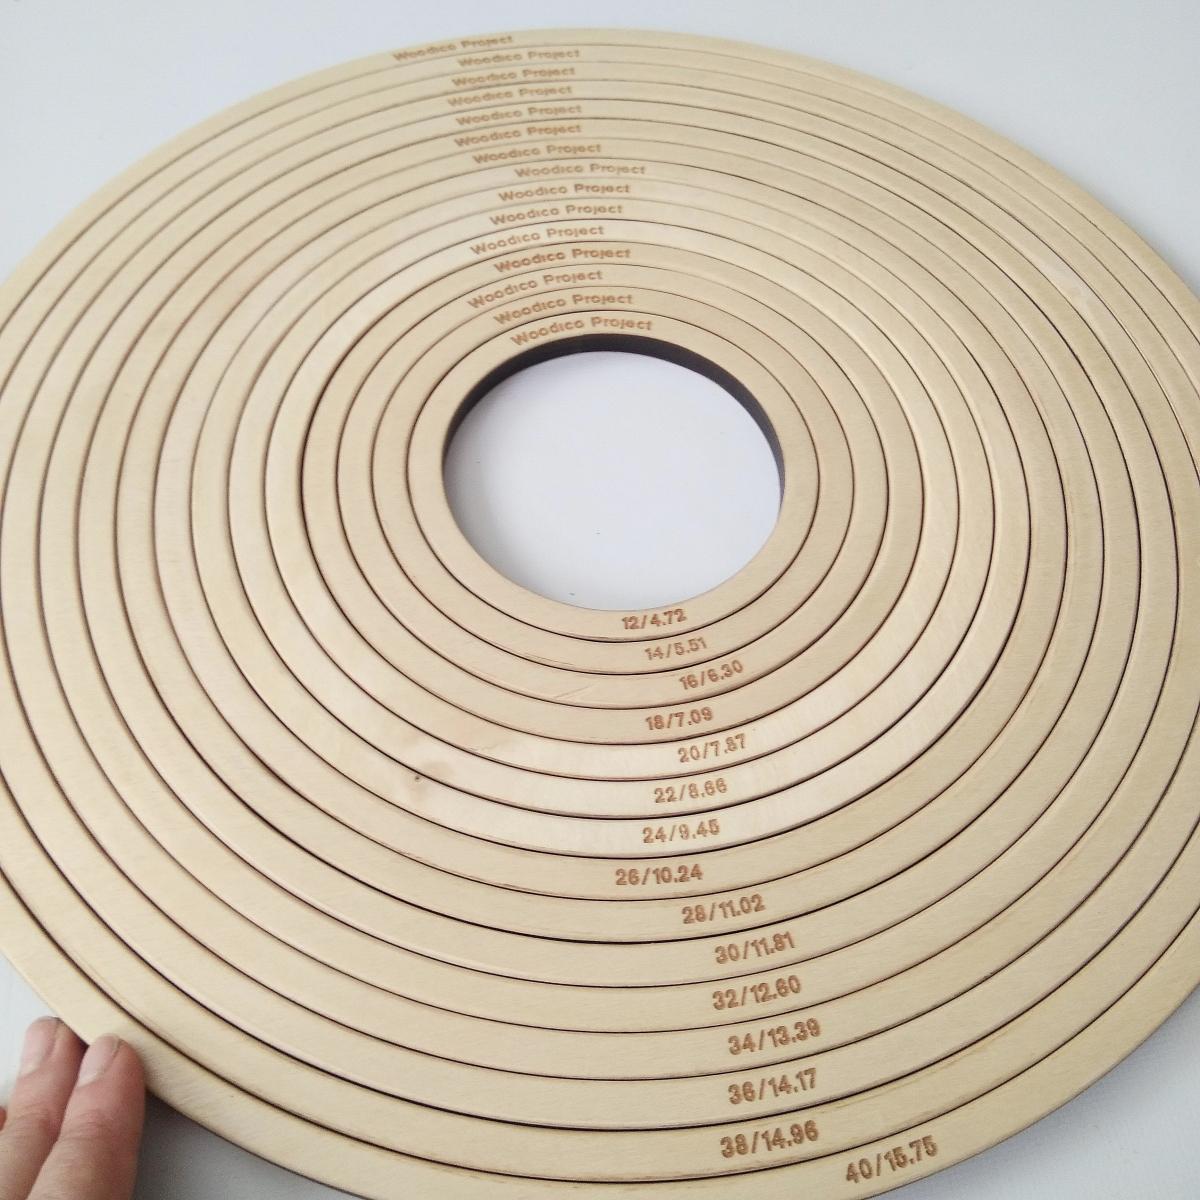 woodico.pro dream catcher base set of 15 rings 12 40 cm 18 1200x1200 - Dream catcher base / Set of 15 rings 12-40 cm